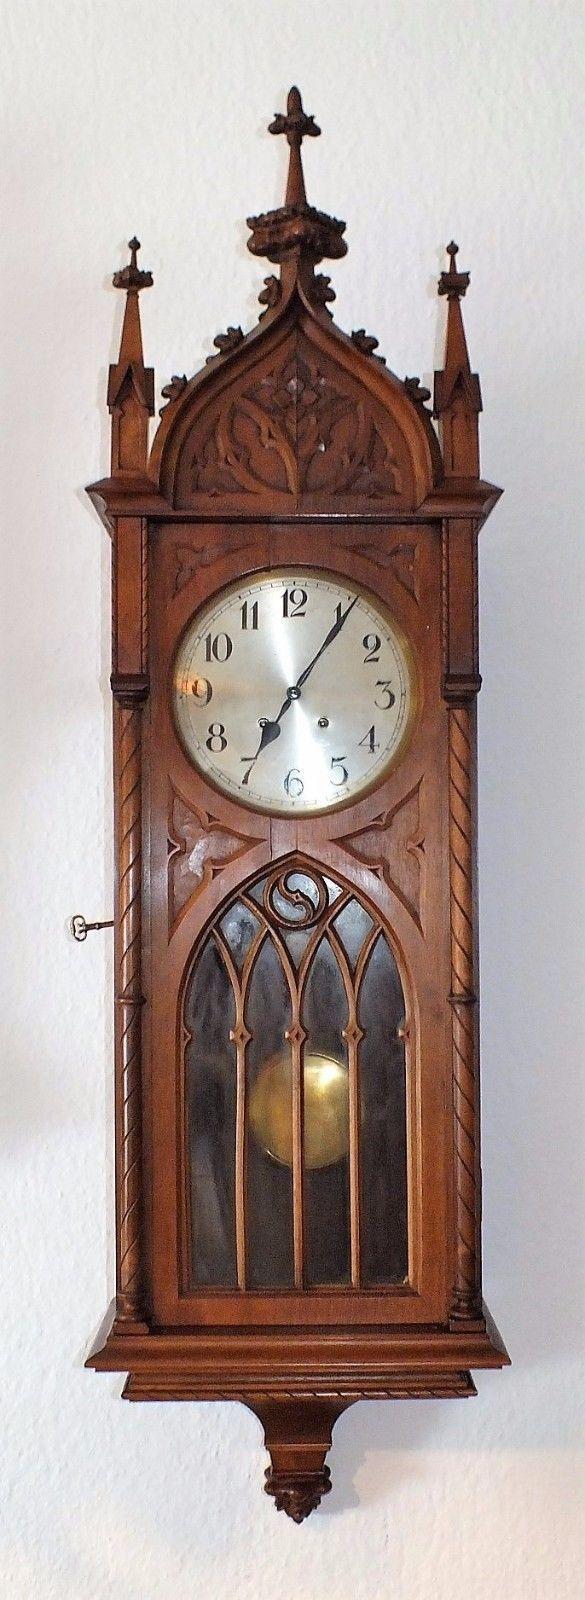 Vintage industrial clock double sided factory clock brilli 233 - 130cm H Lorenz Furtw Ngler Lfs Kathedral Regulator Petit Sonnerie Viertelschlag Ebay Viennaclocksantique